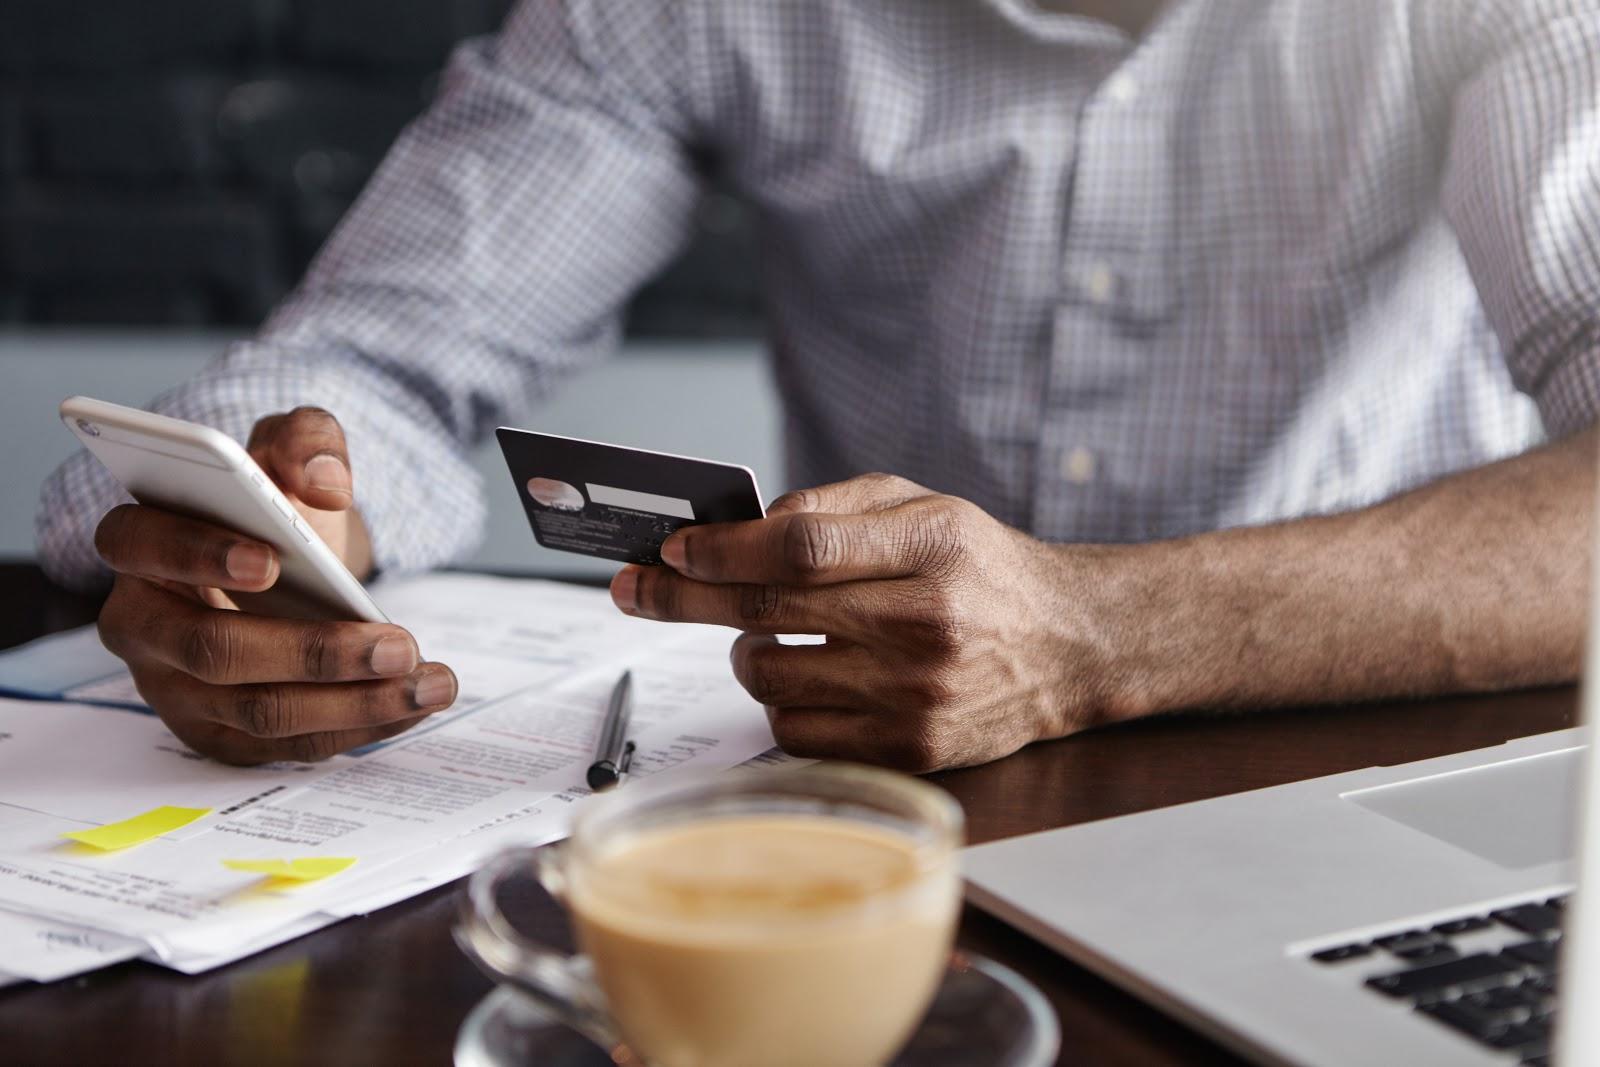 микрокредиты быстро